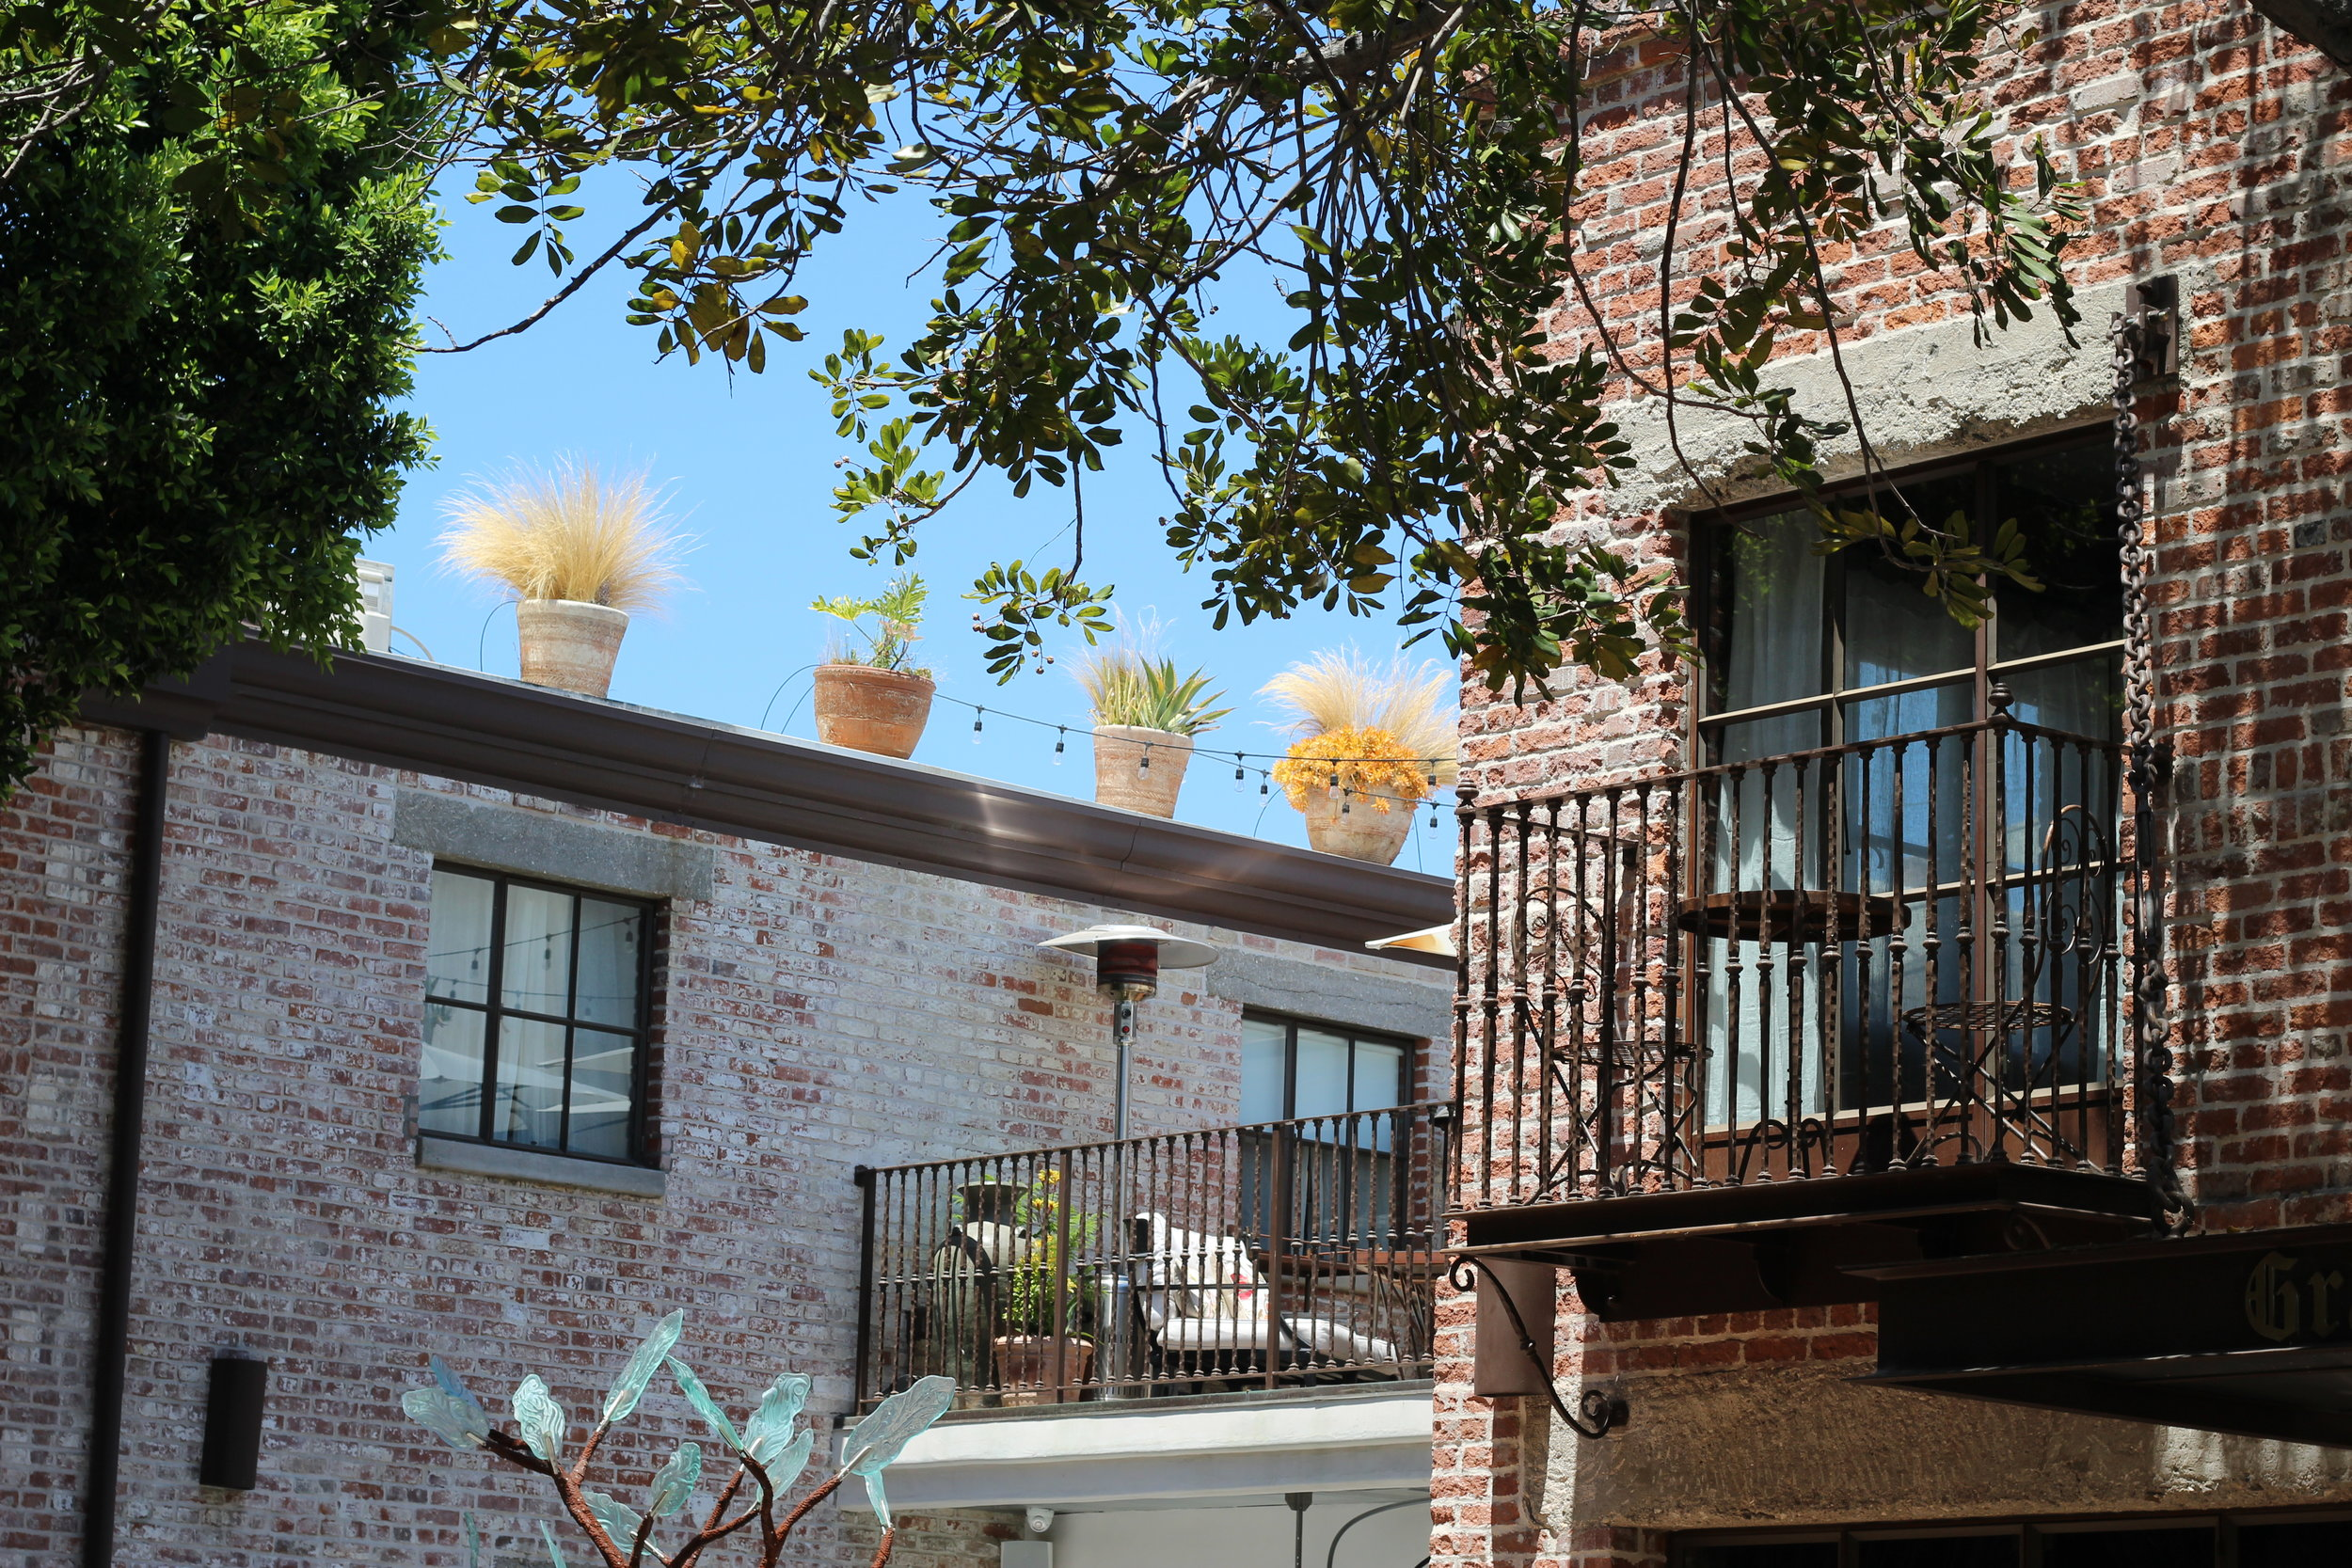 Granada HotelSan Luis Obispo -